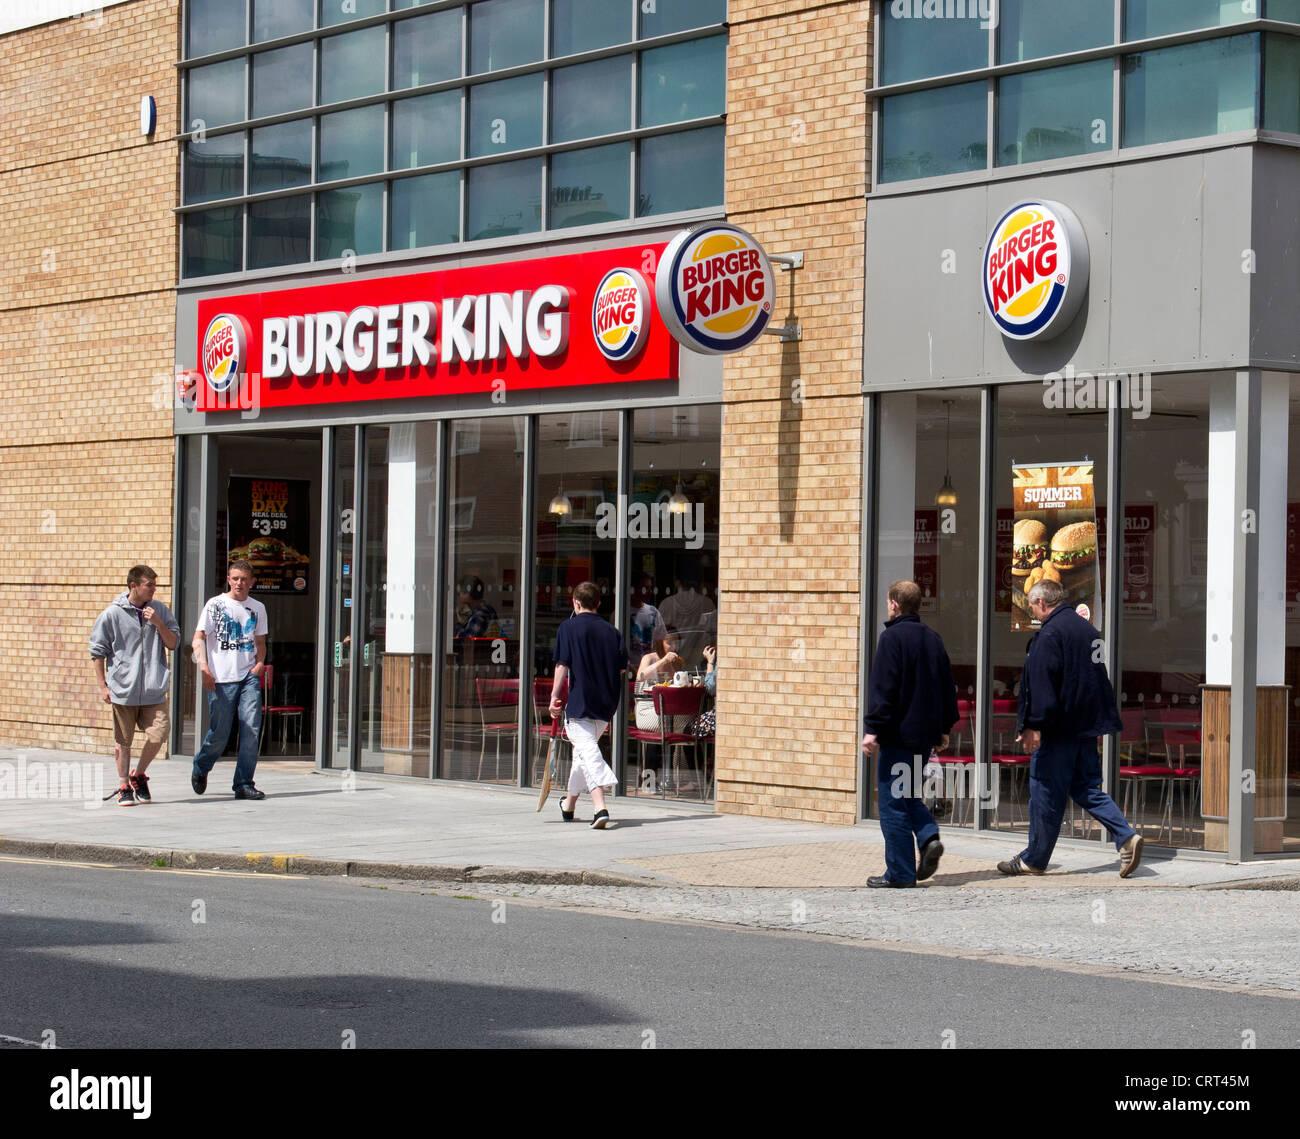 Burger King Fast Food Restaurant Folkestone UK - Stock Image